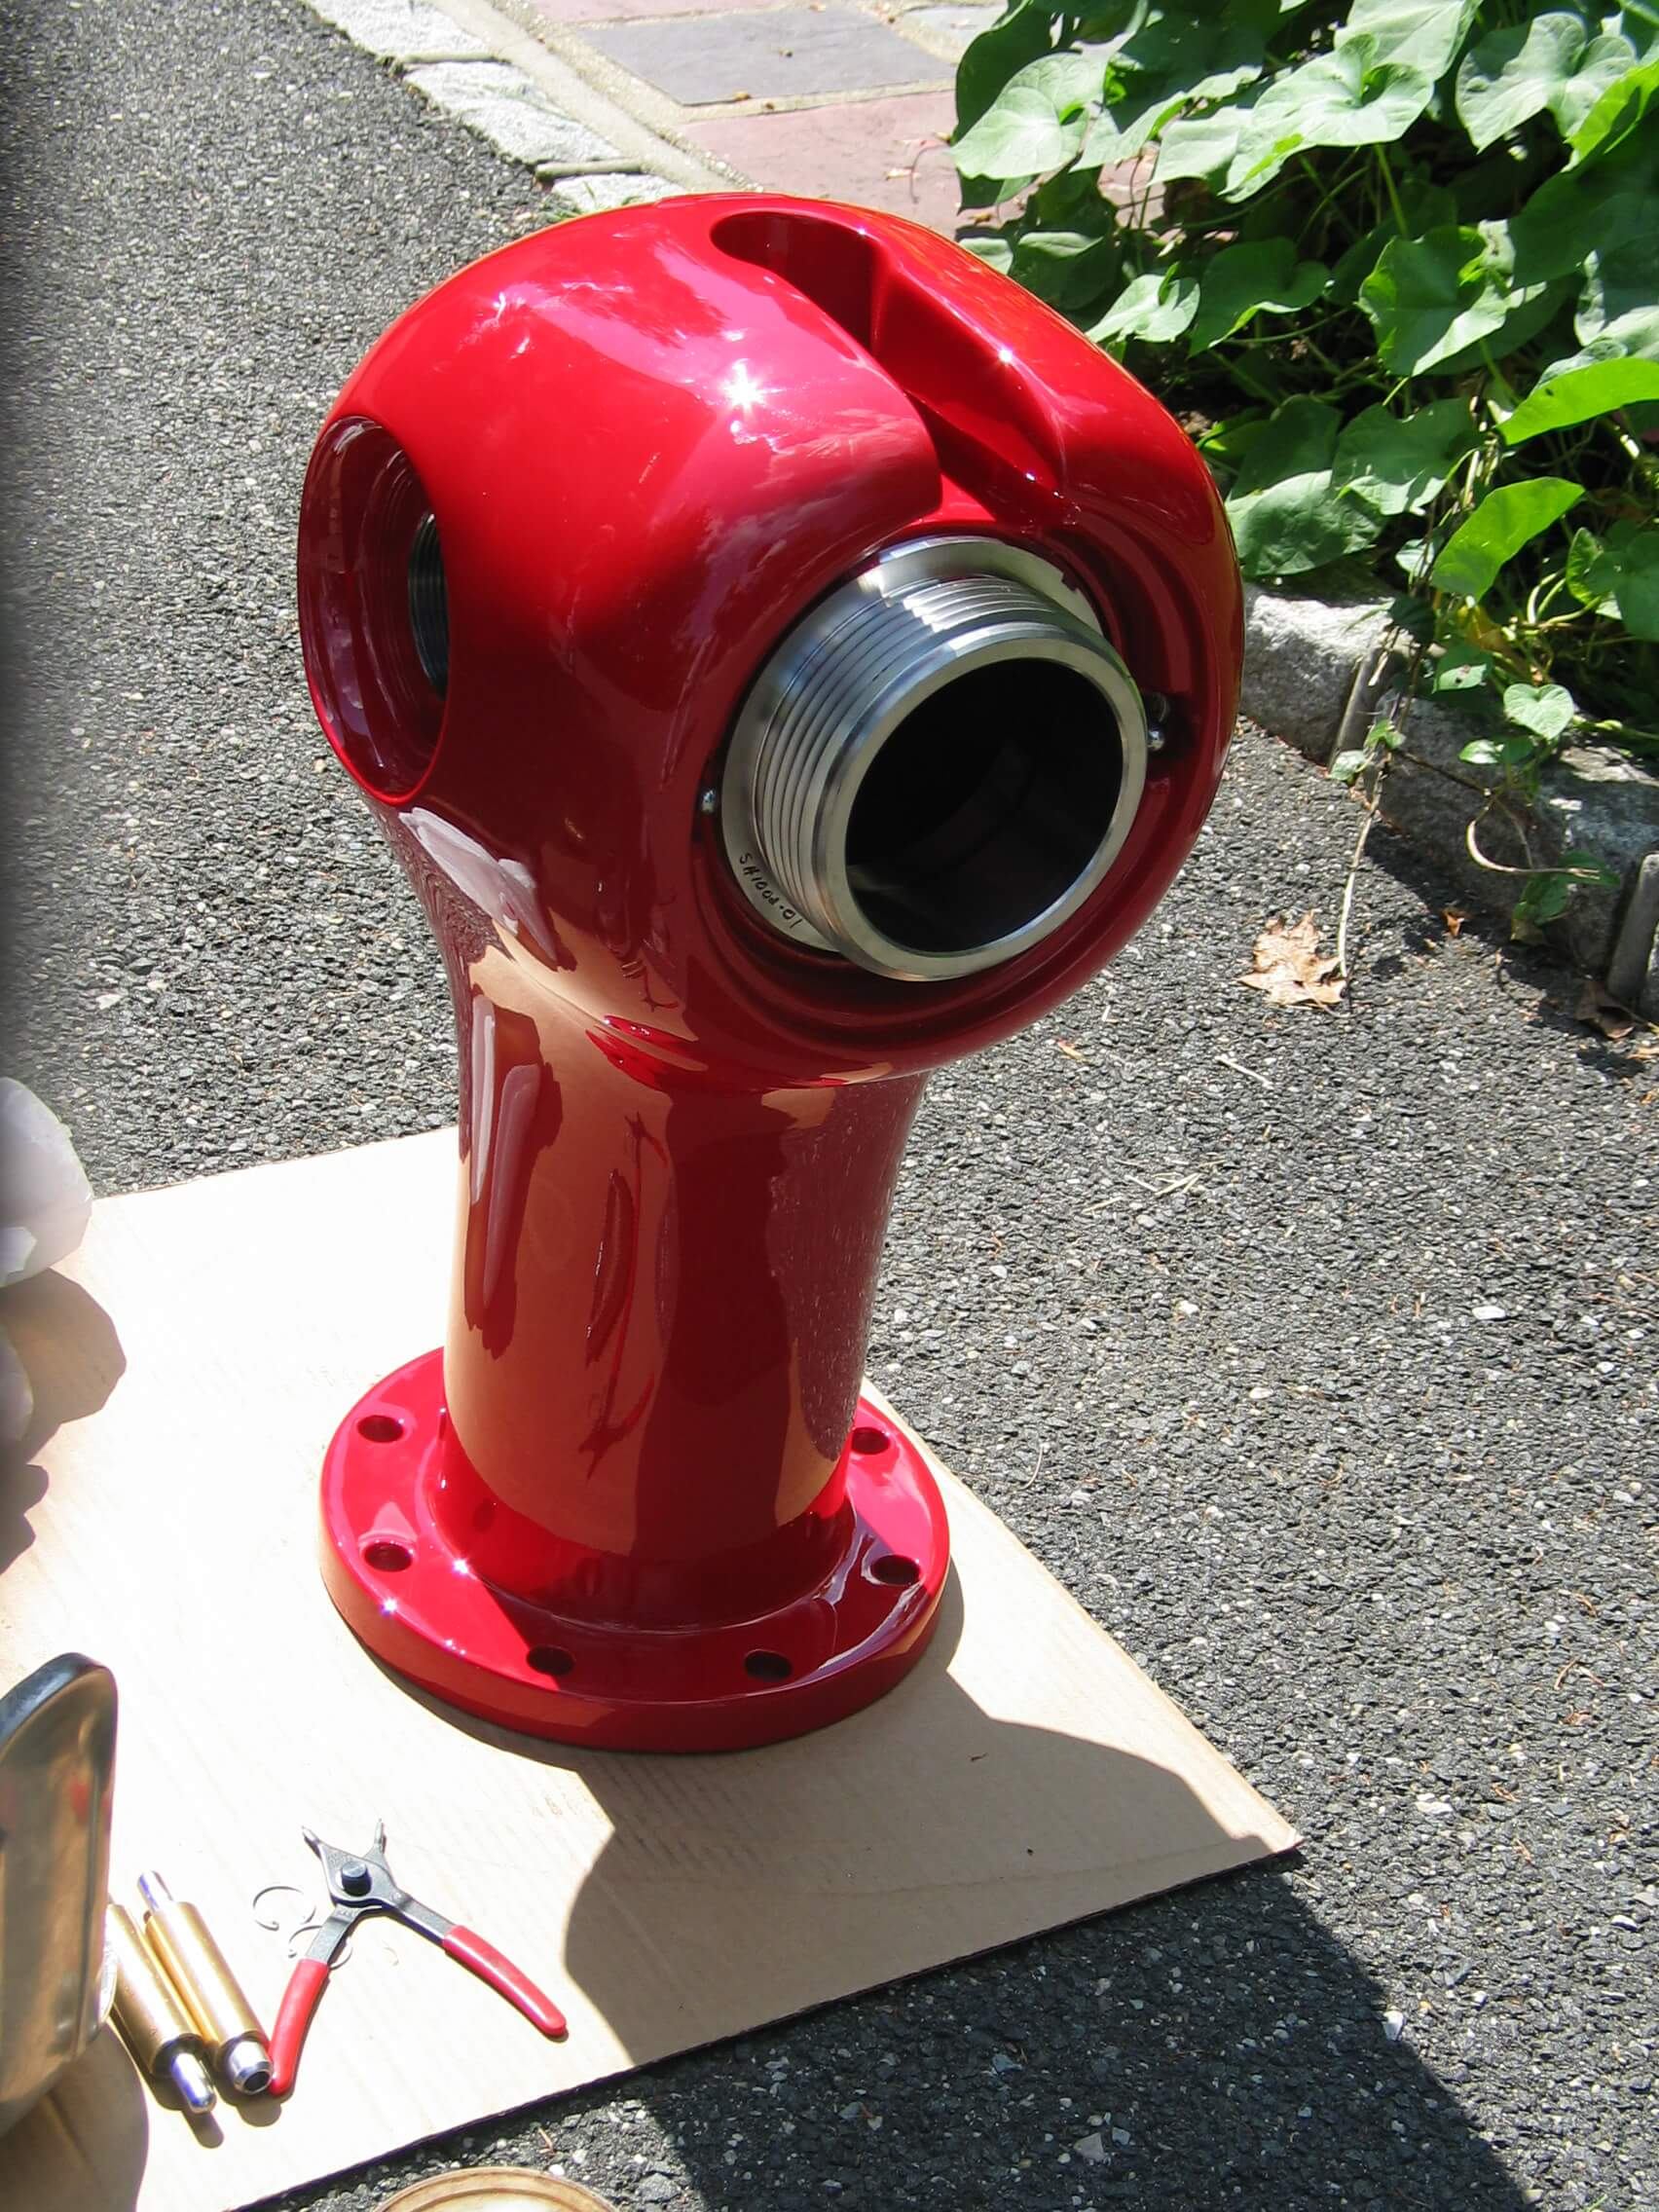 Closeup of hydrant